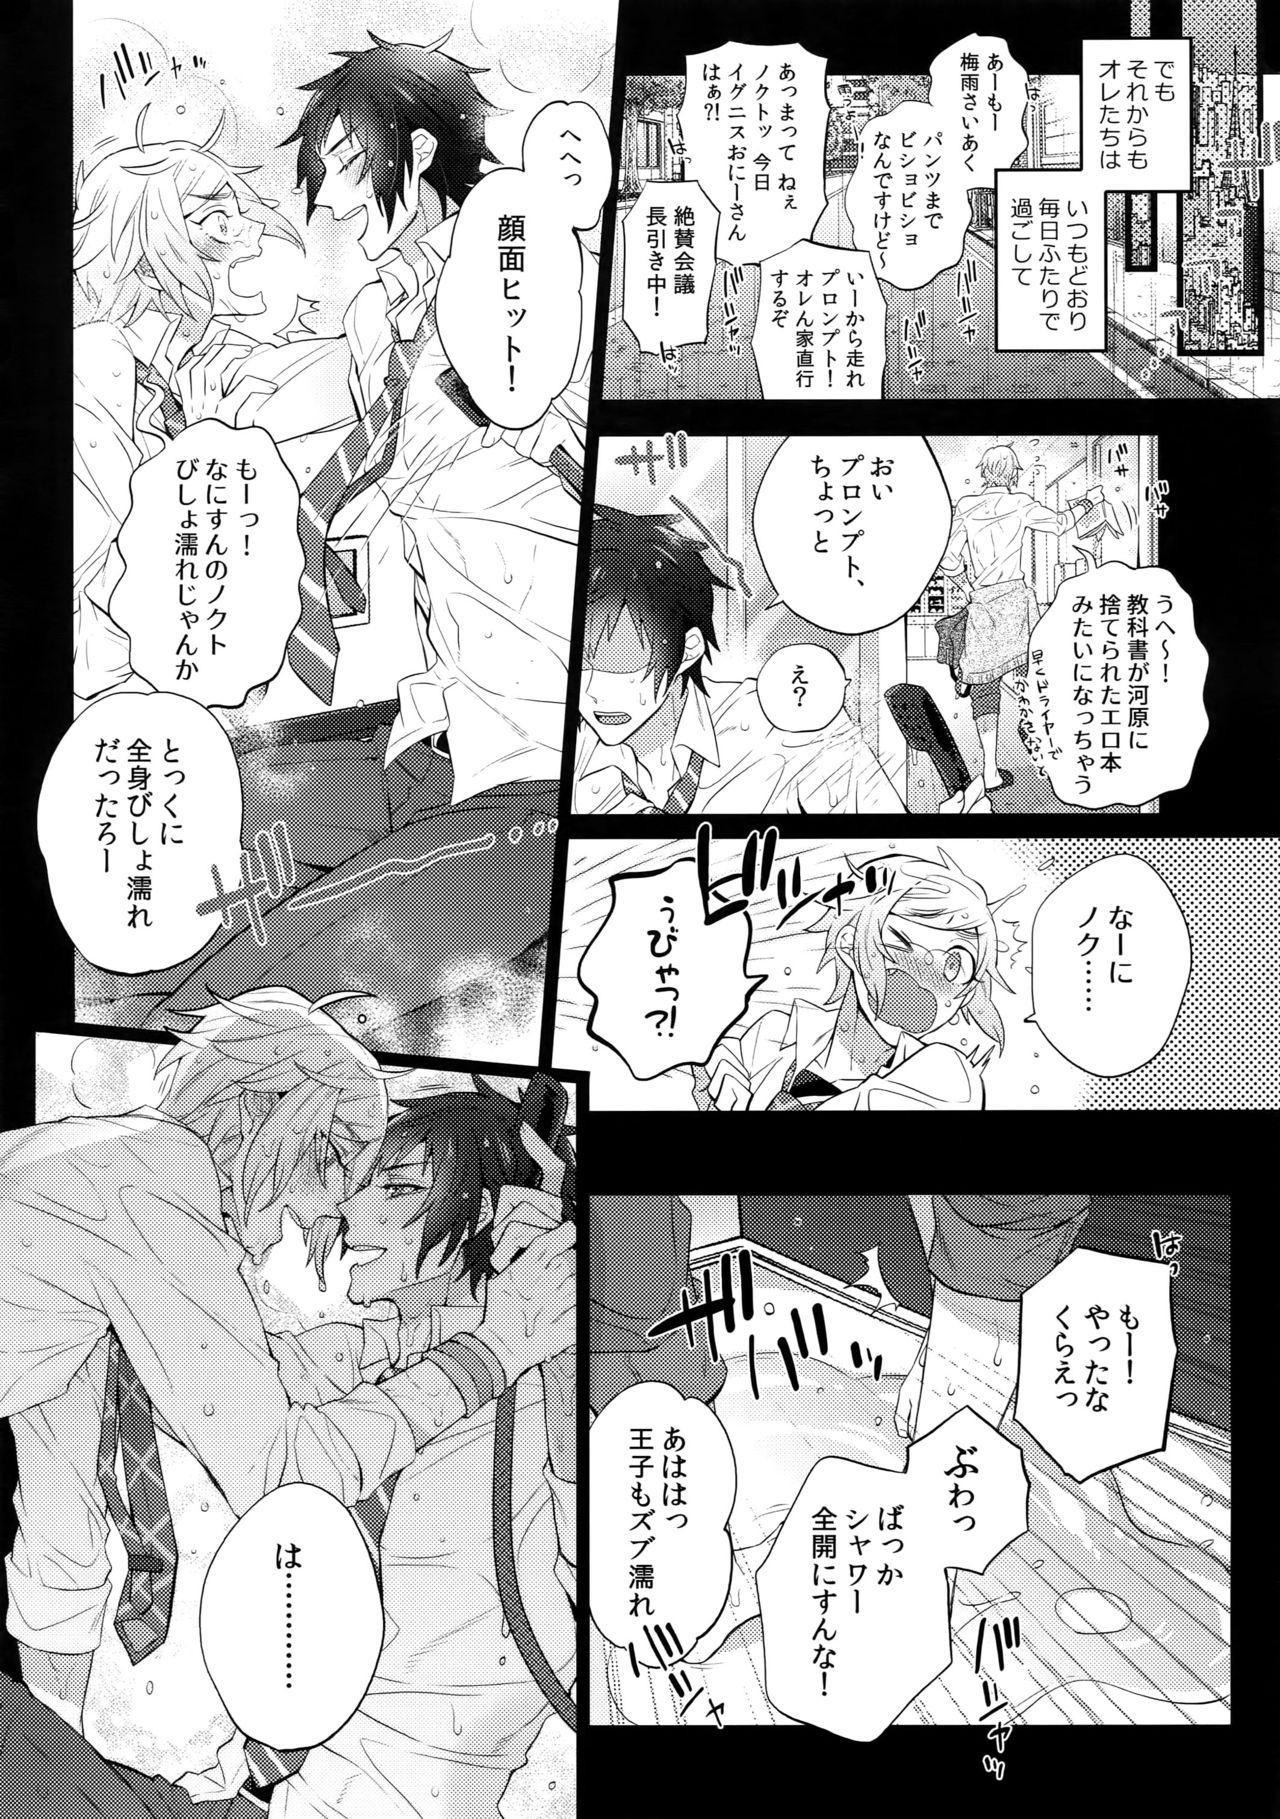 Yuri Kiss 2 3